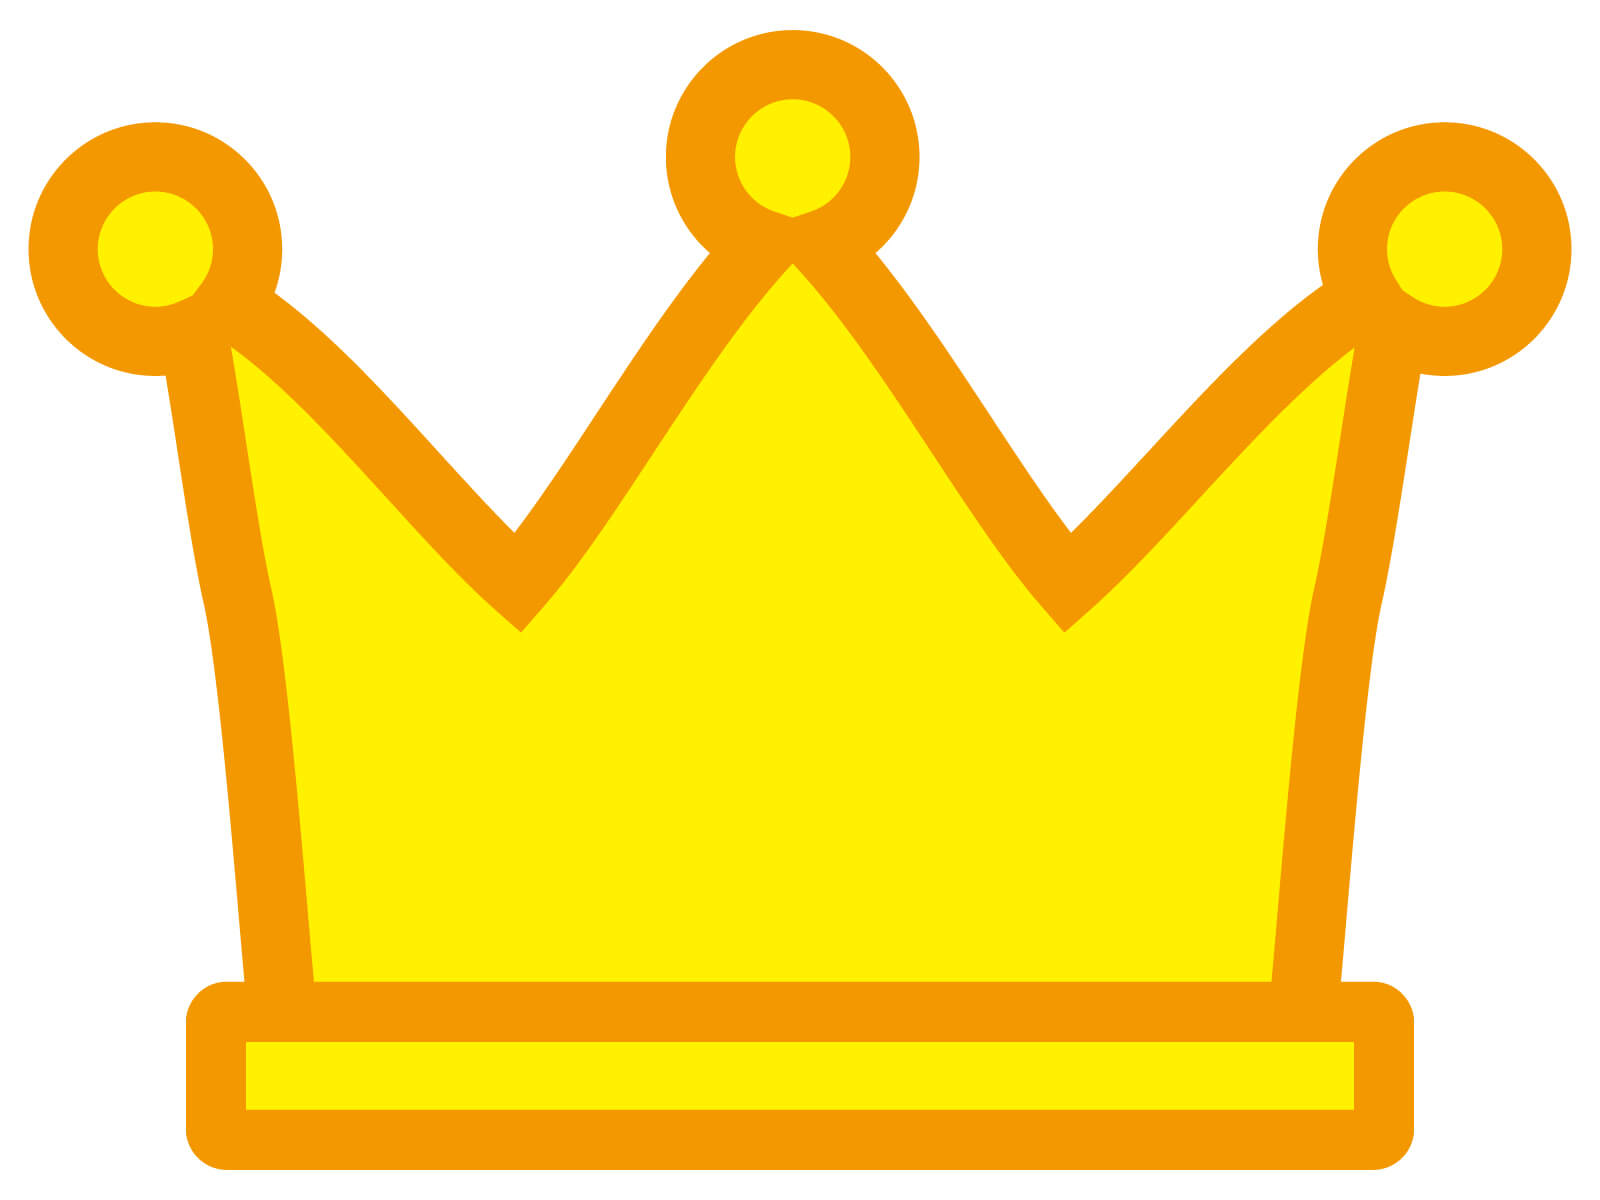 M-12017決勝進出者の結果と優勝者!歴代王者とファイナリスト